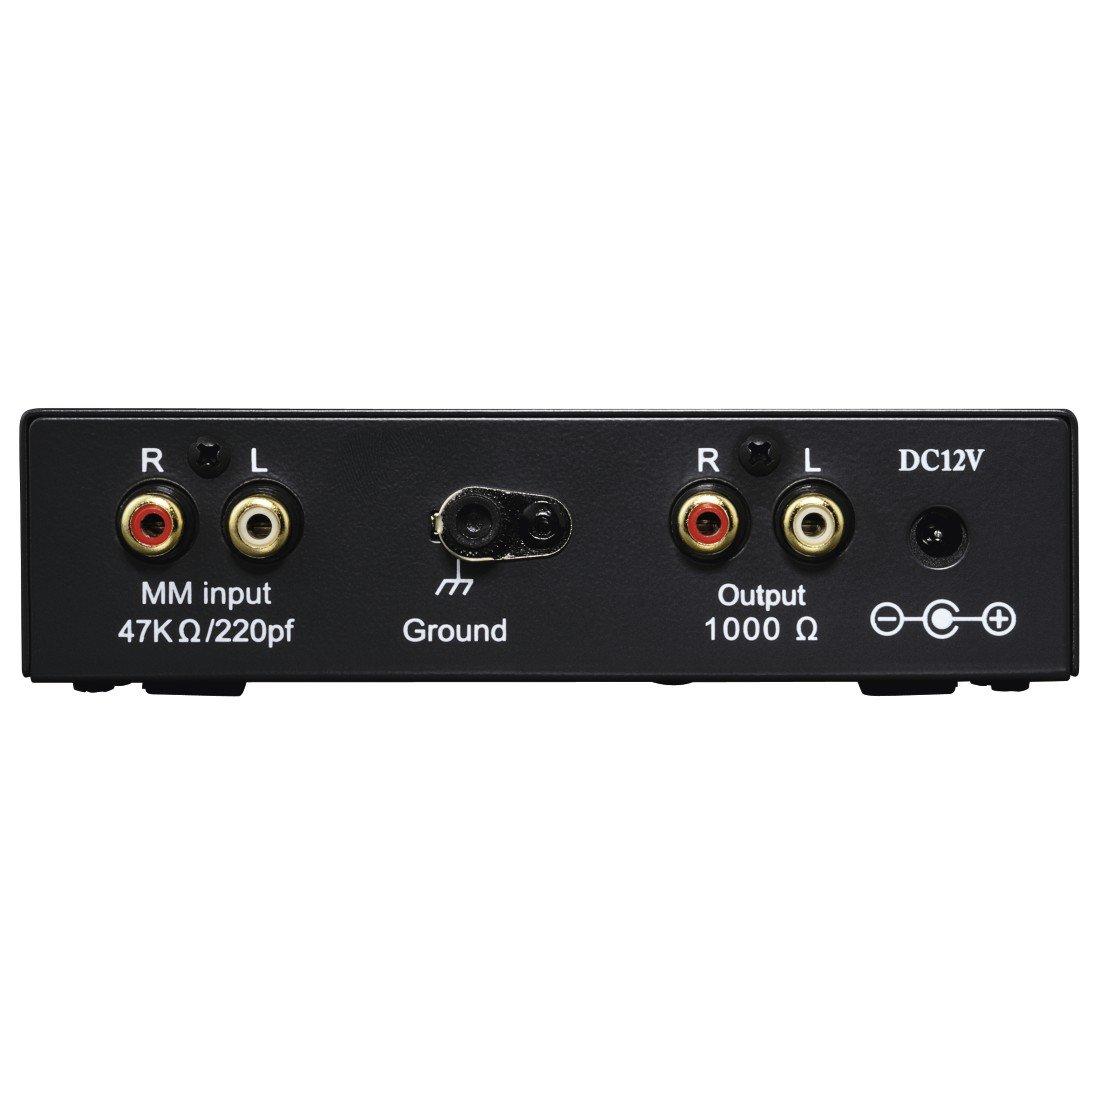 Hama PA 506 - Preamplificador de fono (230 V, 50 Hz, 300 mA), negro 00040506